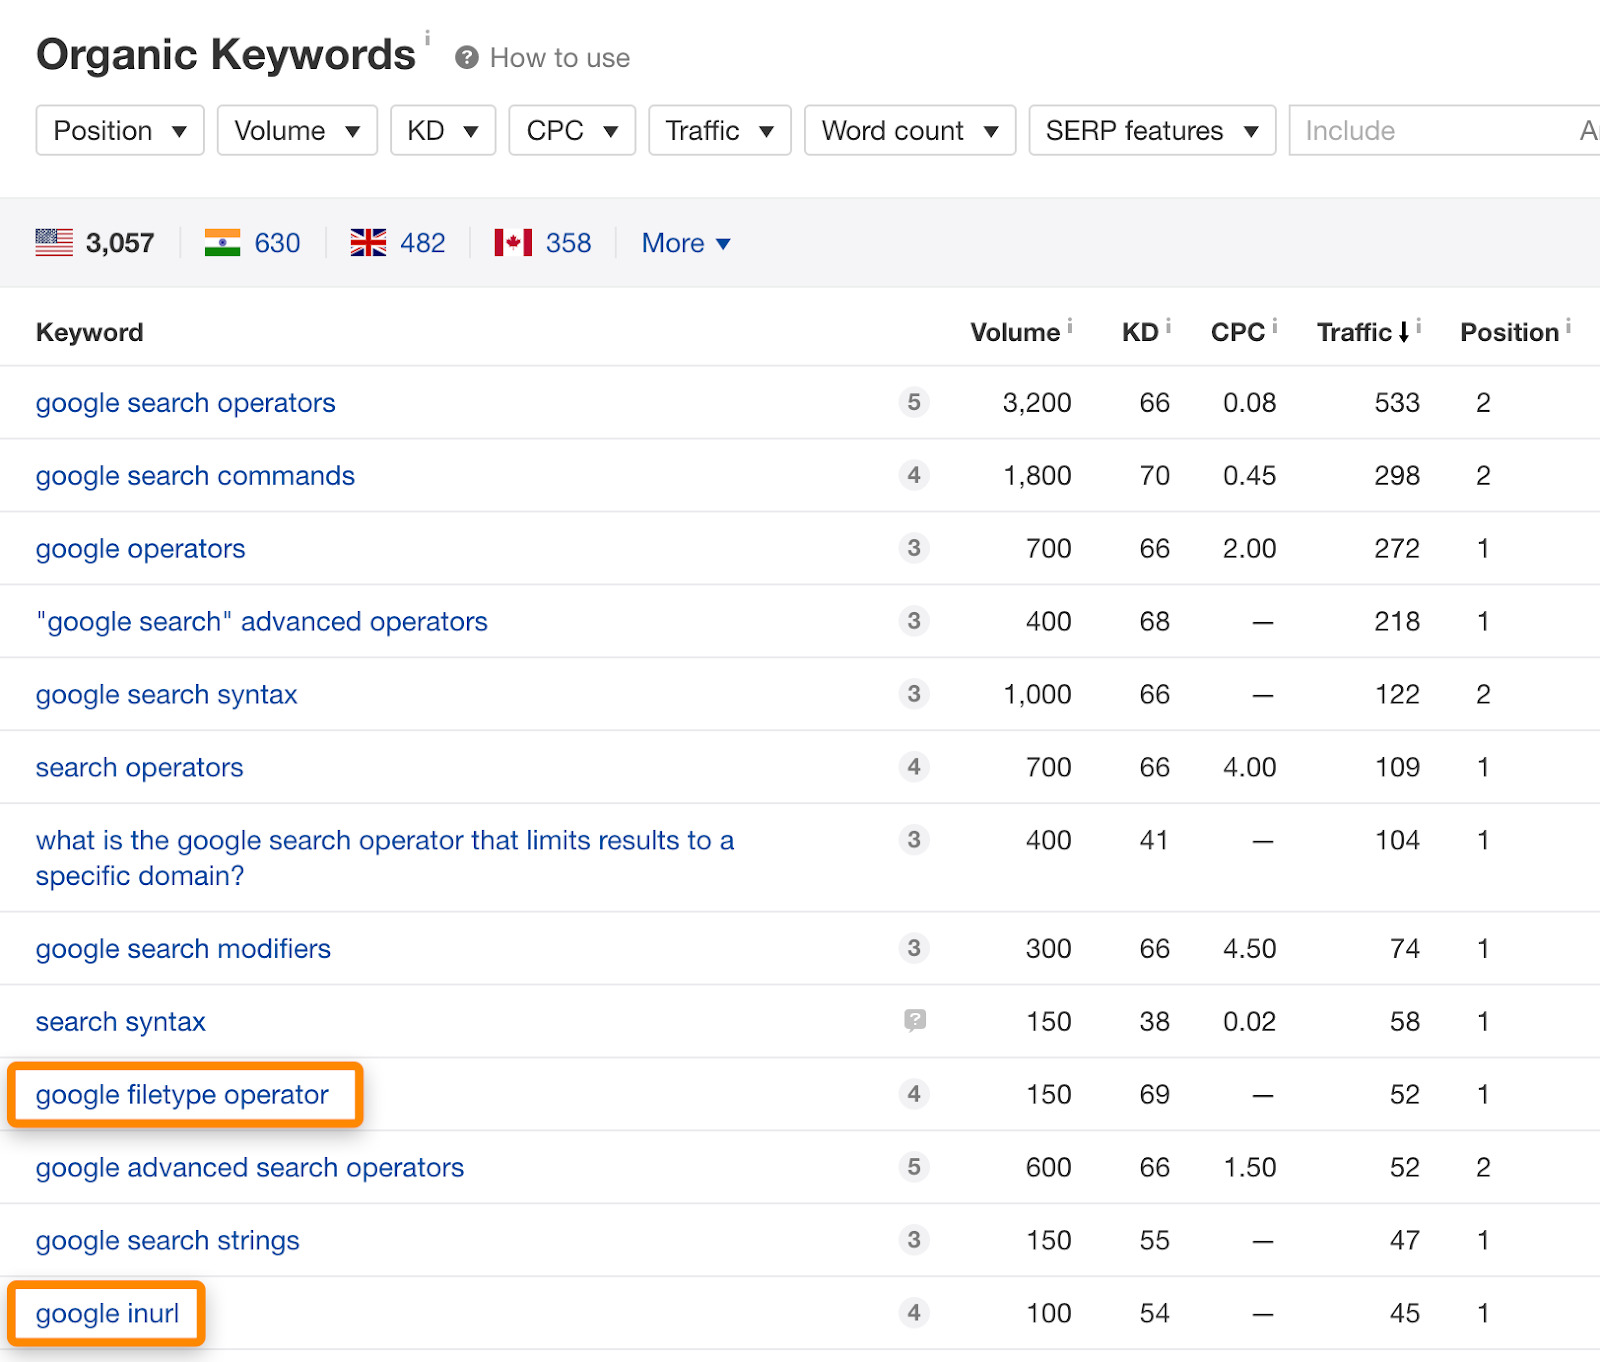 5 keywords google search operators